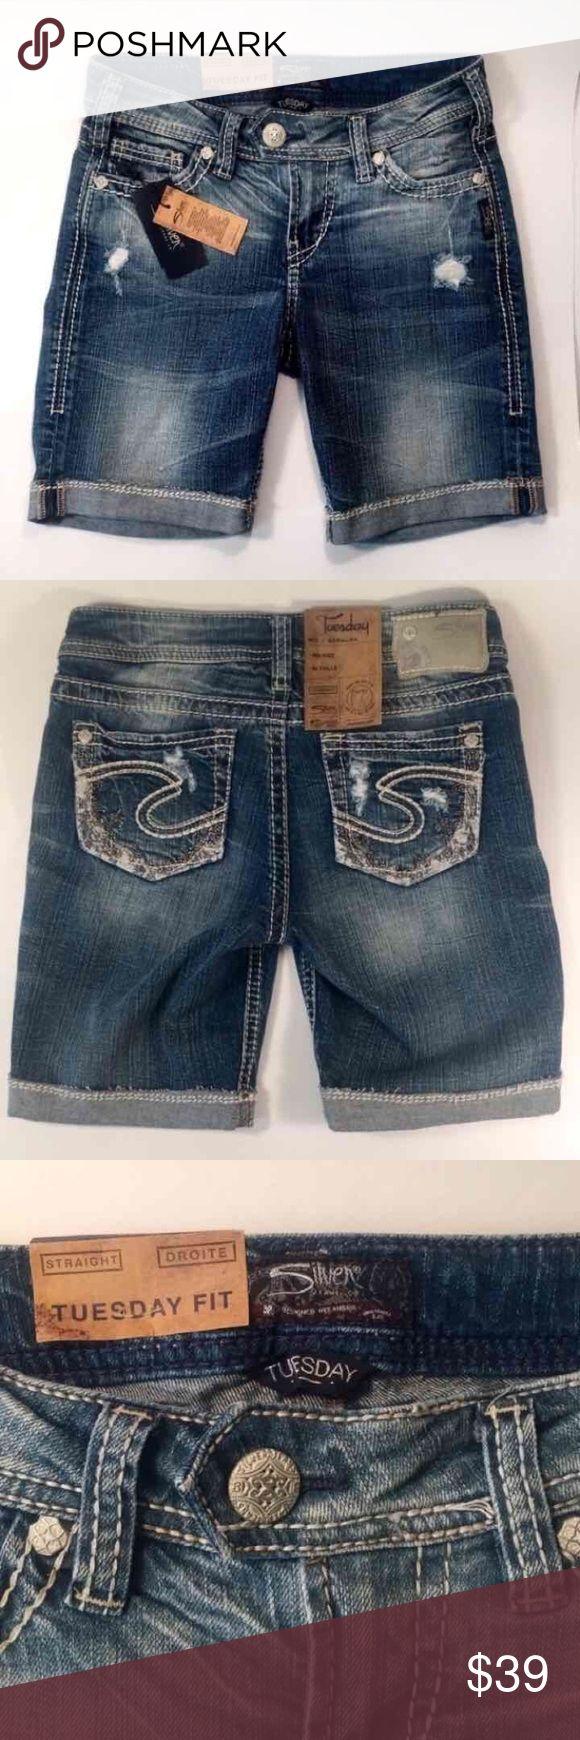 Silver Jeans Tuesday Bermuda Shorts Women's straight, mid-rise Tuesday Bermuda Jean Shorts, size 26. Silver Jeans Shorts Jean Shorts